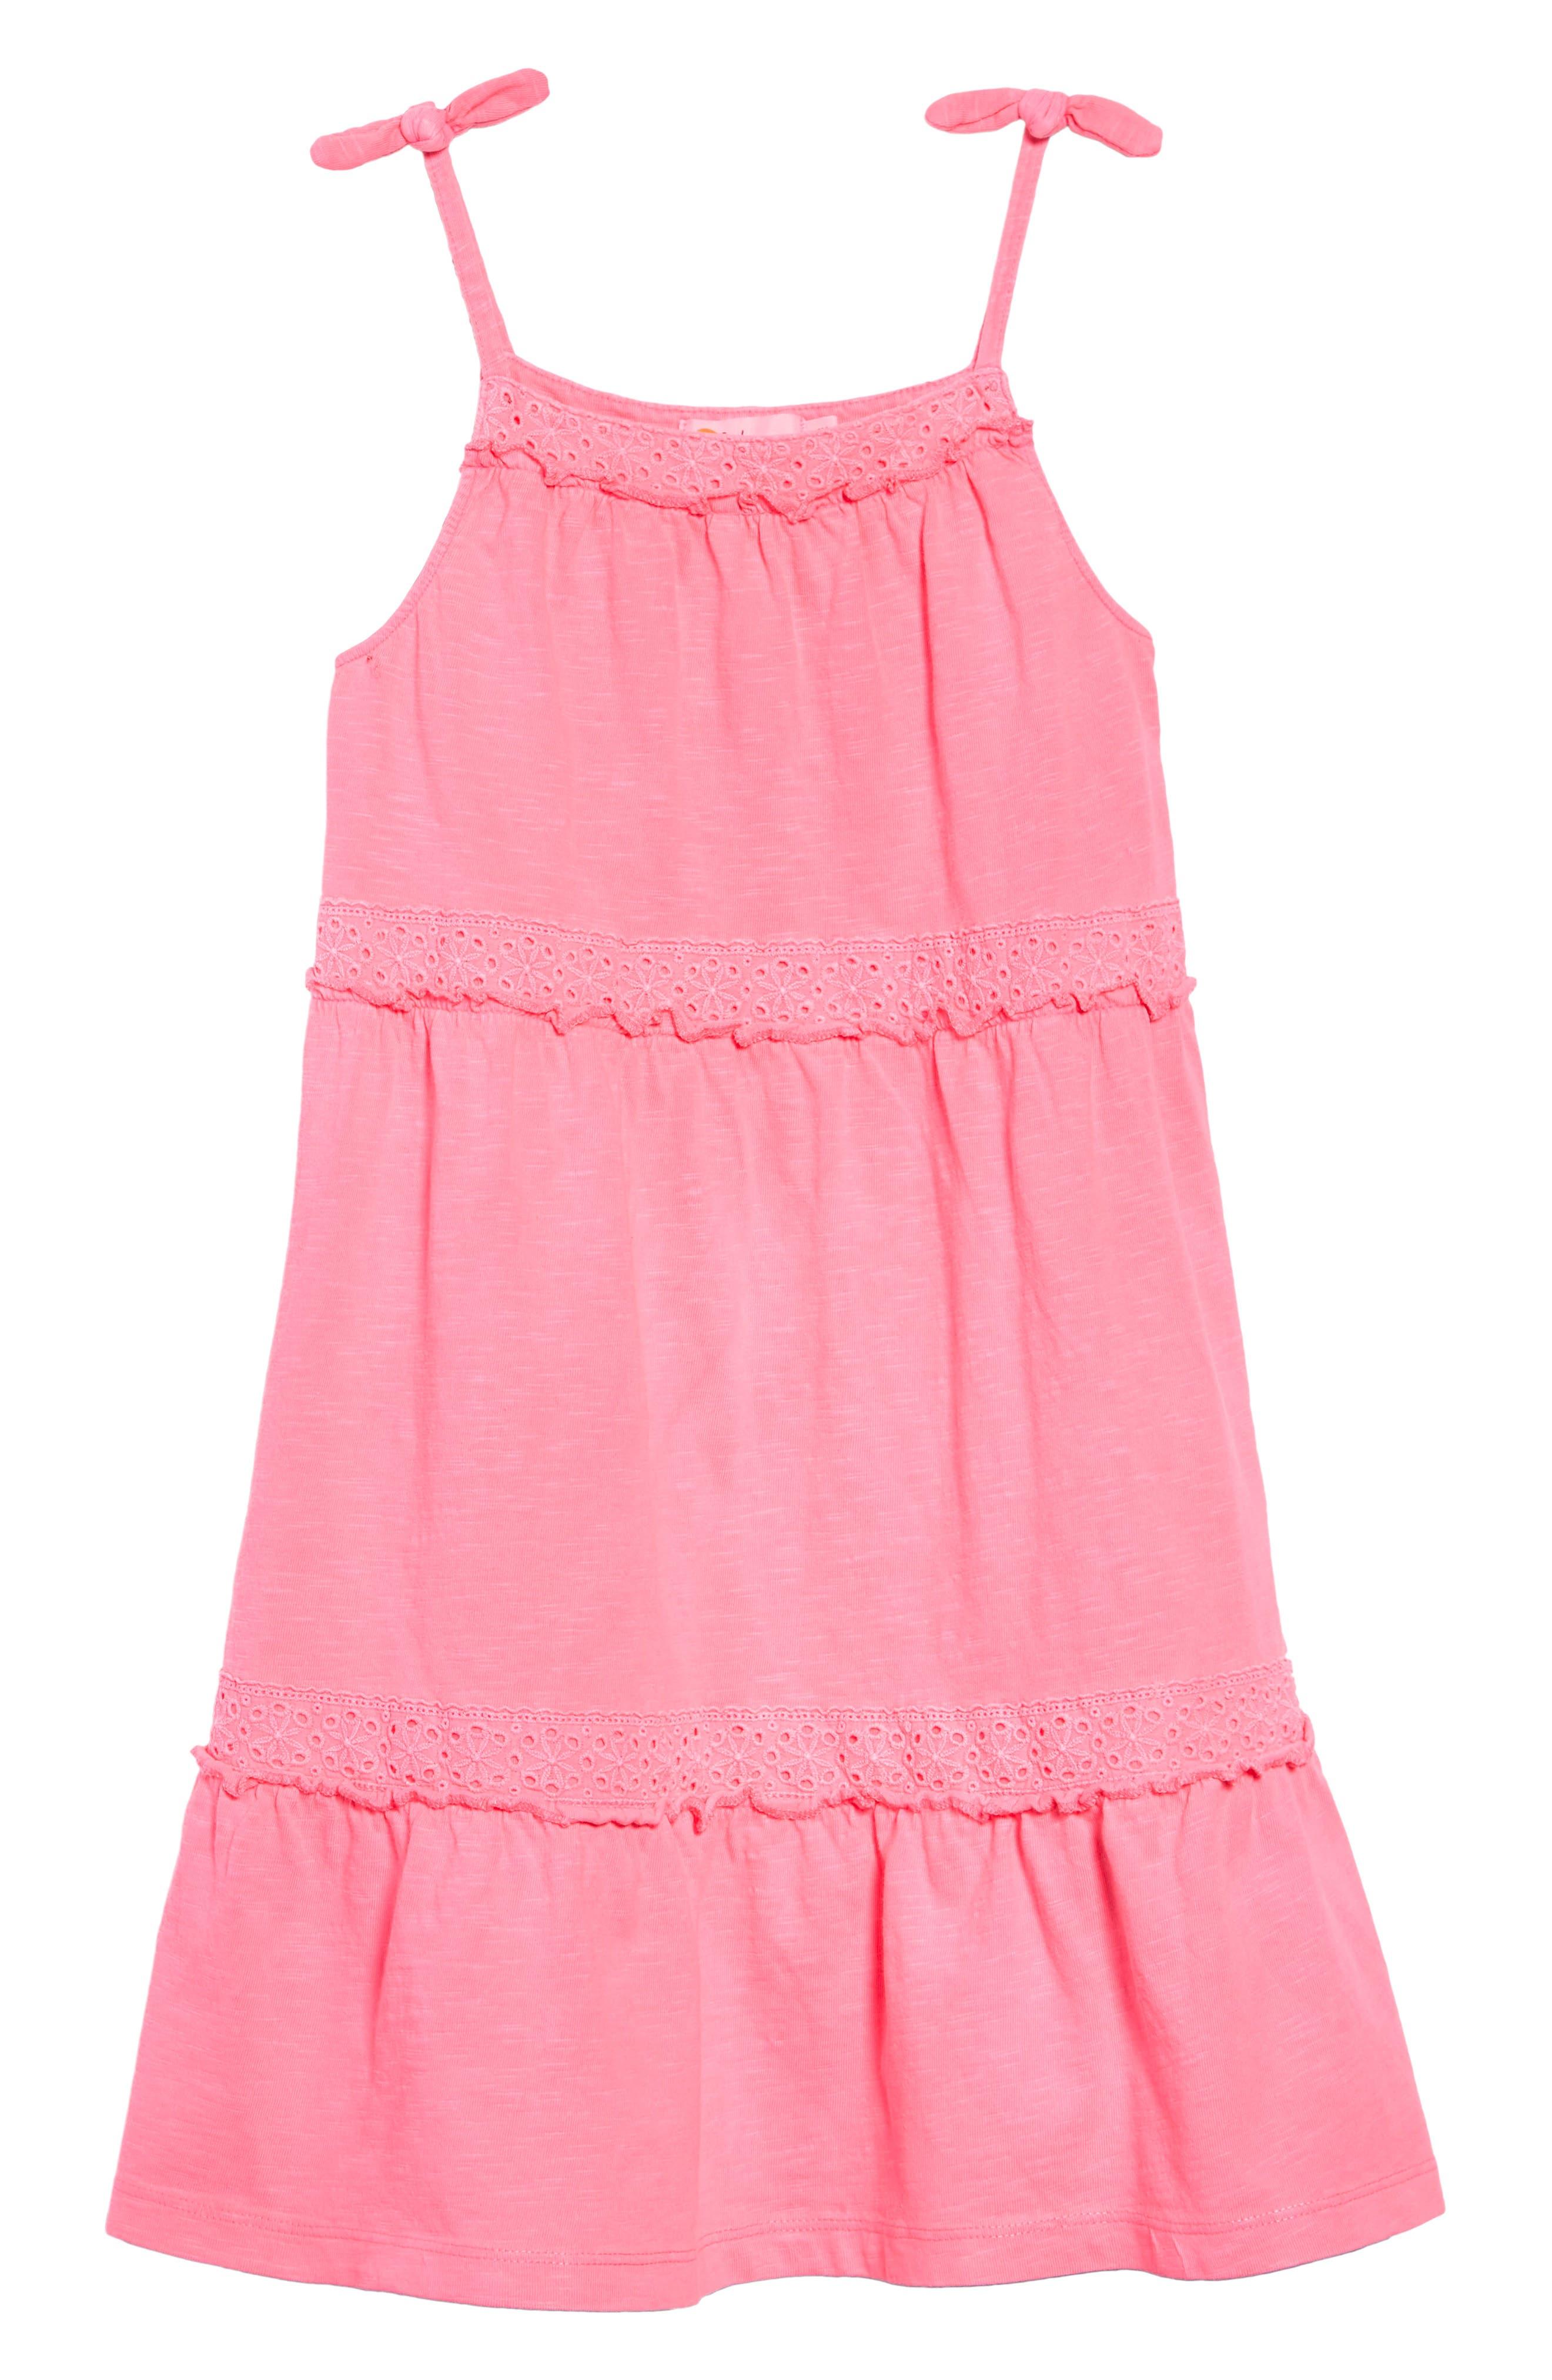 07b3be2f7484 Big Girls' Mini Boden Dresses & Rompers: Knit, Lace & Satin | Nordstrom